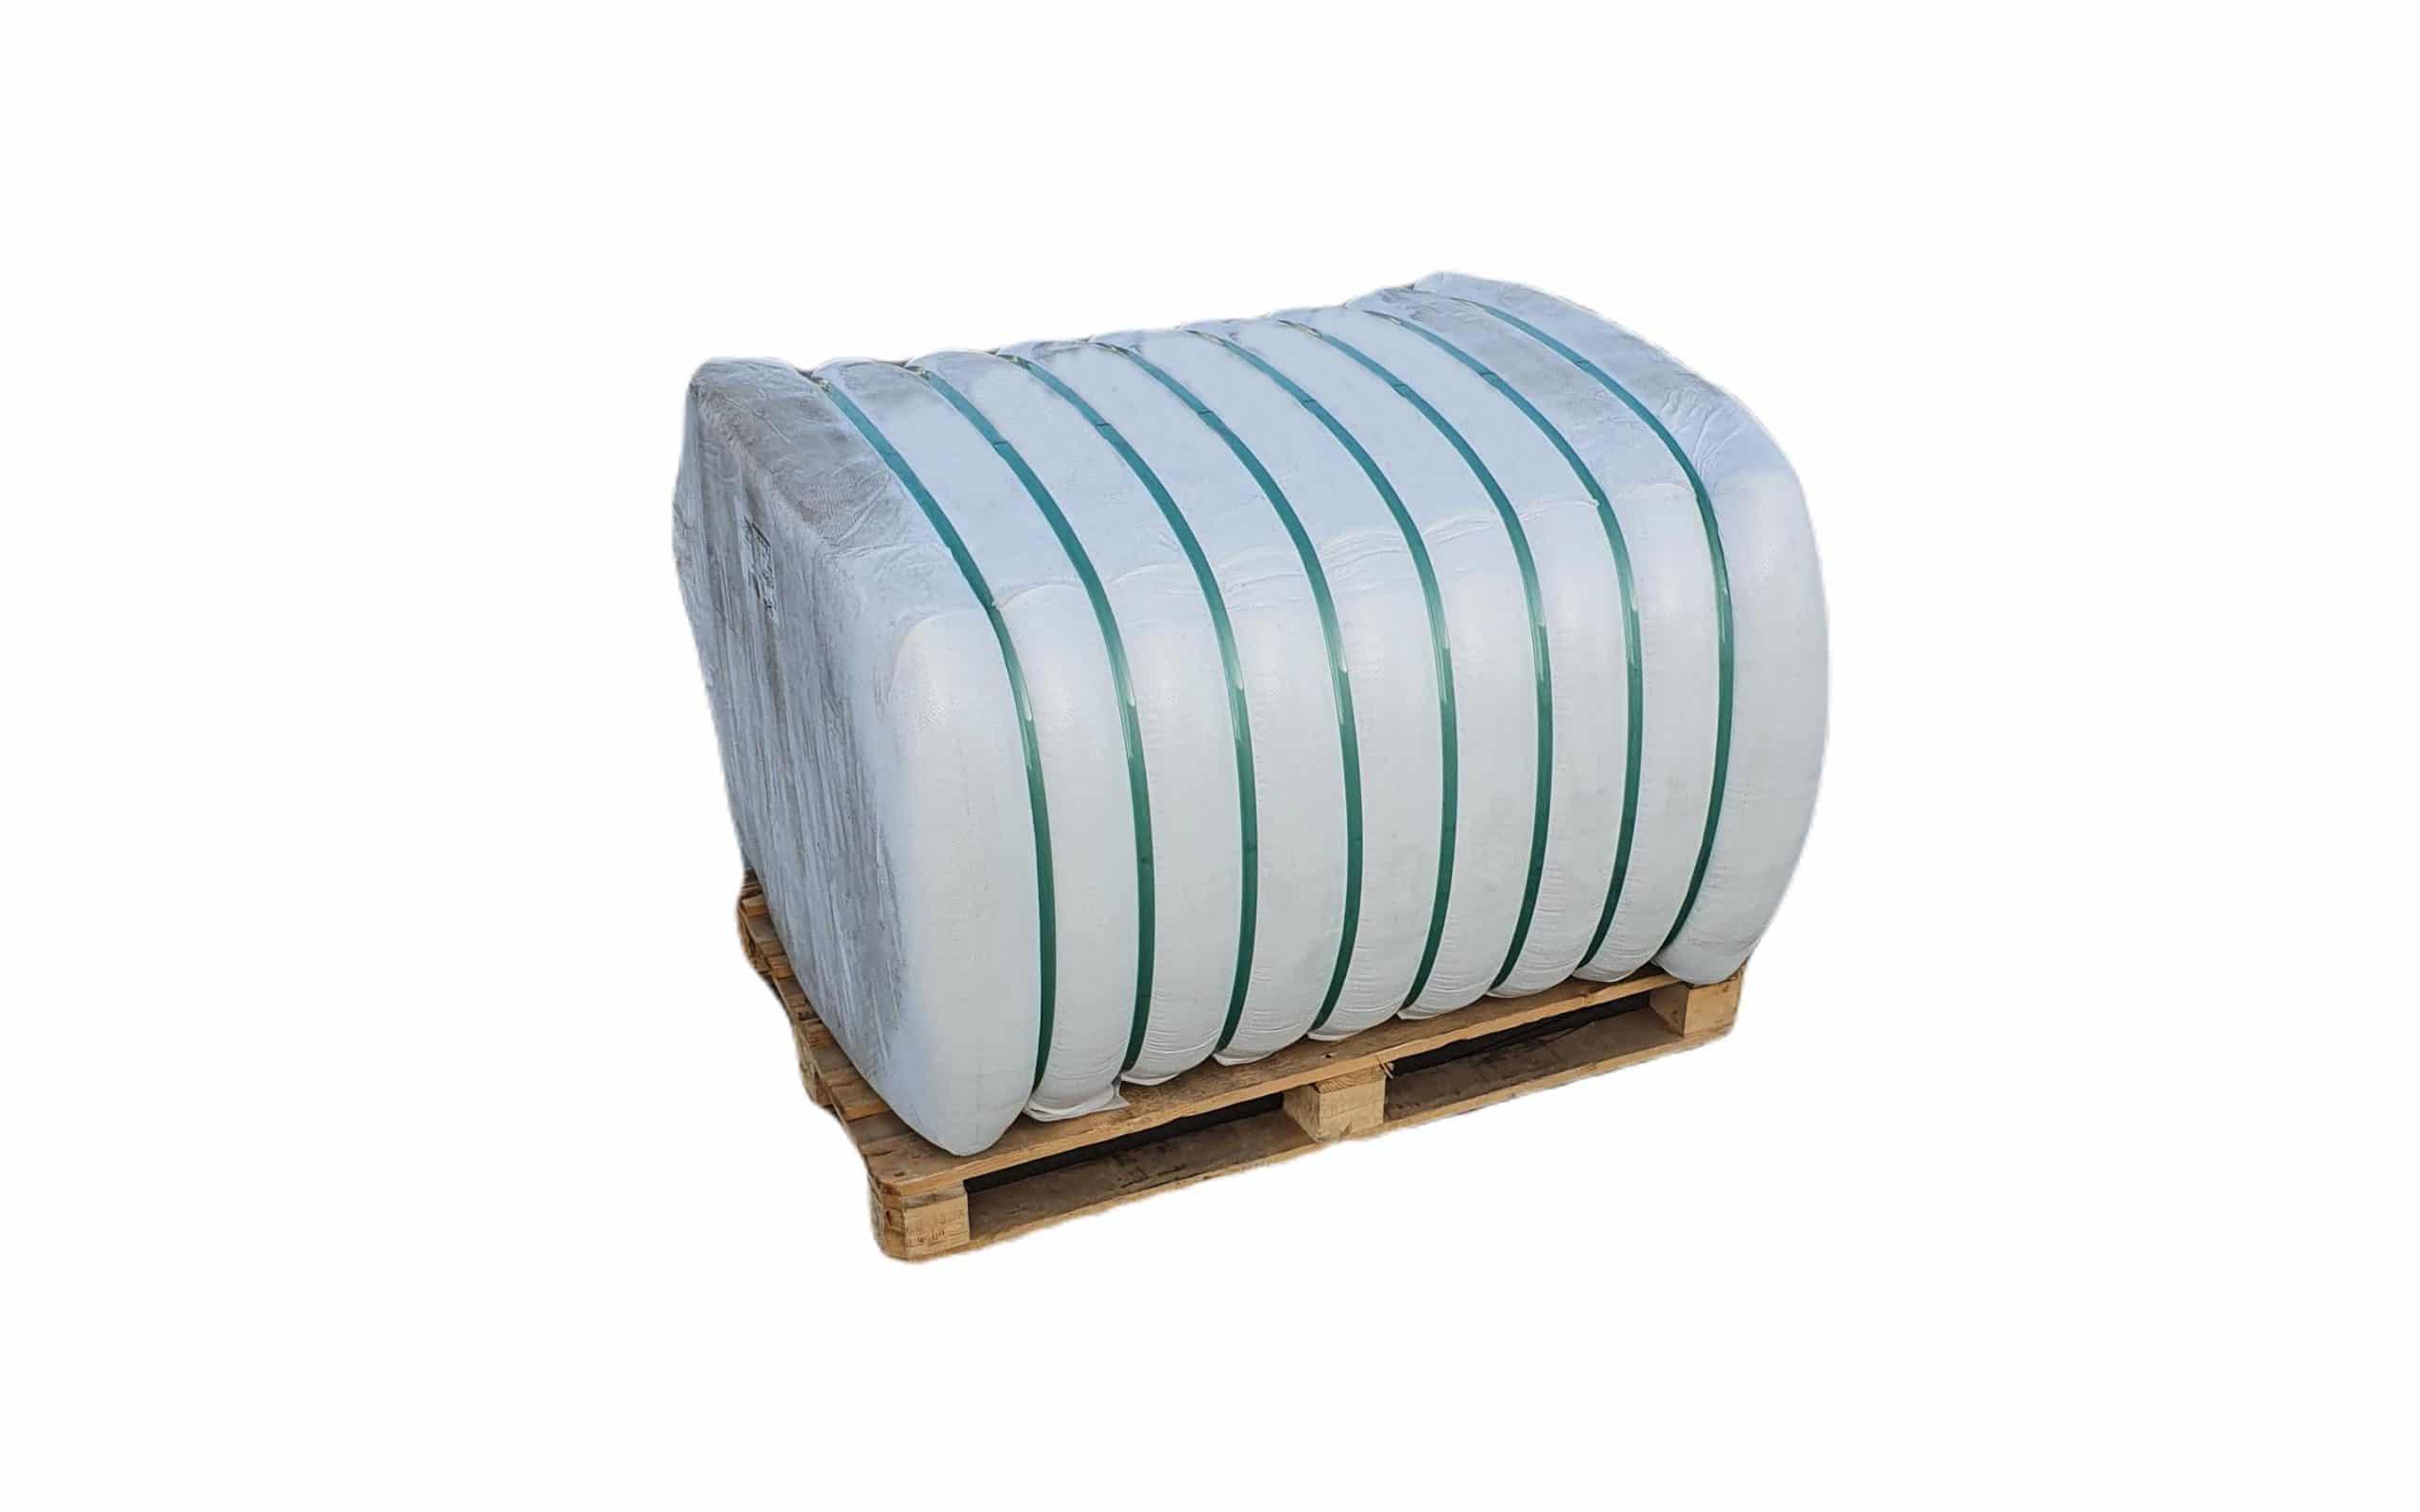 Fibra poliester hollow siliconizata conjugata, HCS 7D x 32 mm pentru fabricare umplutura perne si pilote, 1 x 250 Kg poza somnart.ro